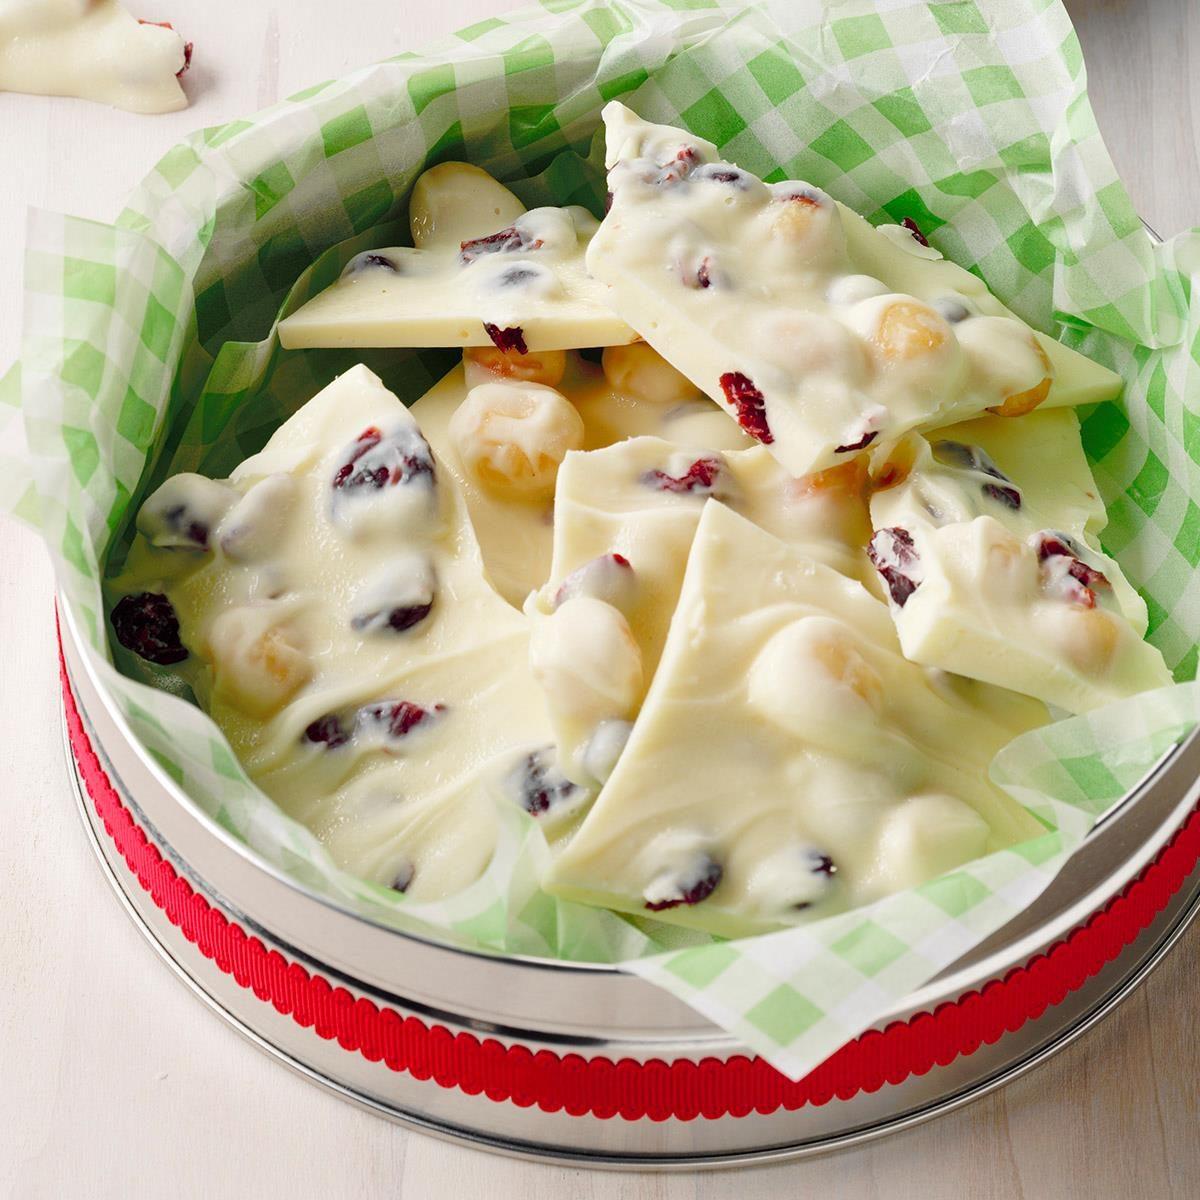 Chocolate Cashew Bark Dunmore Candy Kitchen: Cranberry Macadamia Bark Recipe